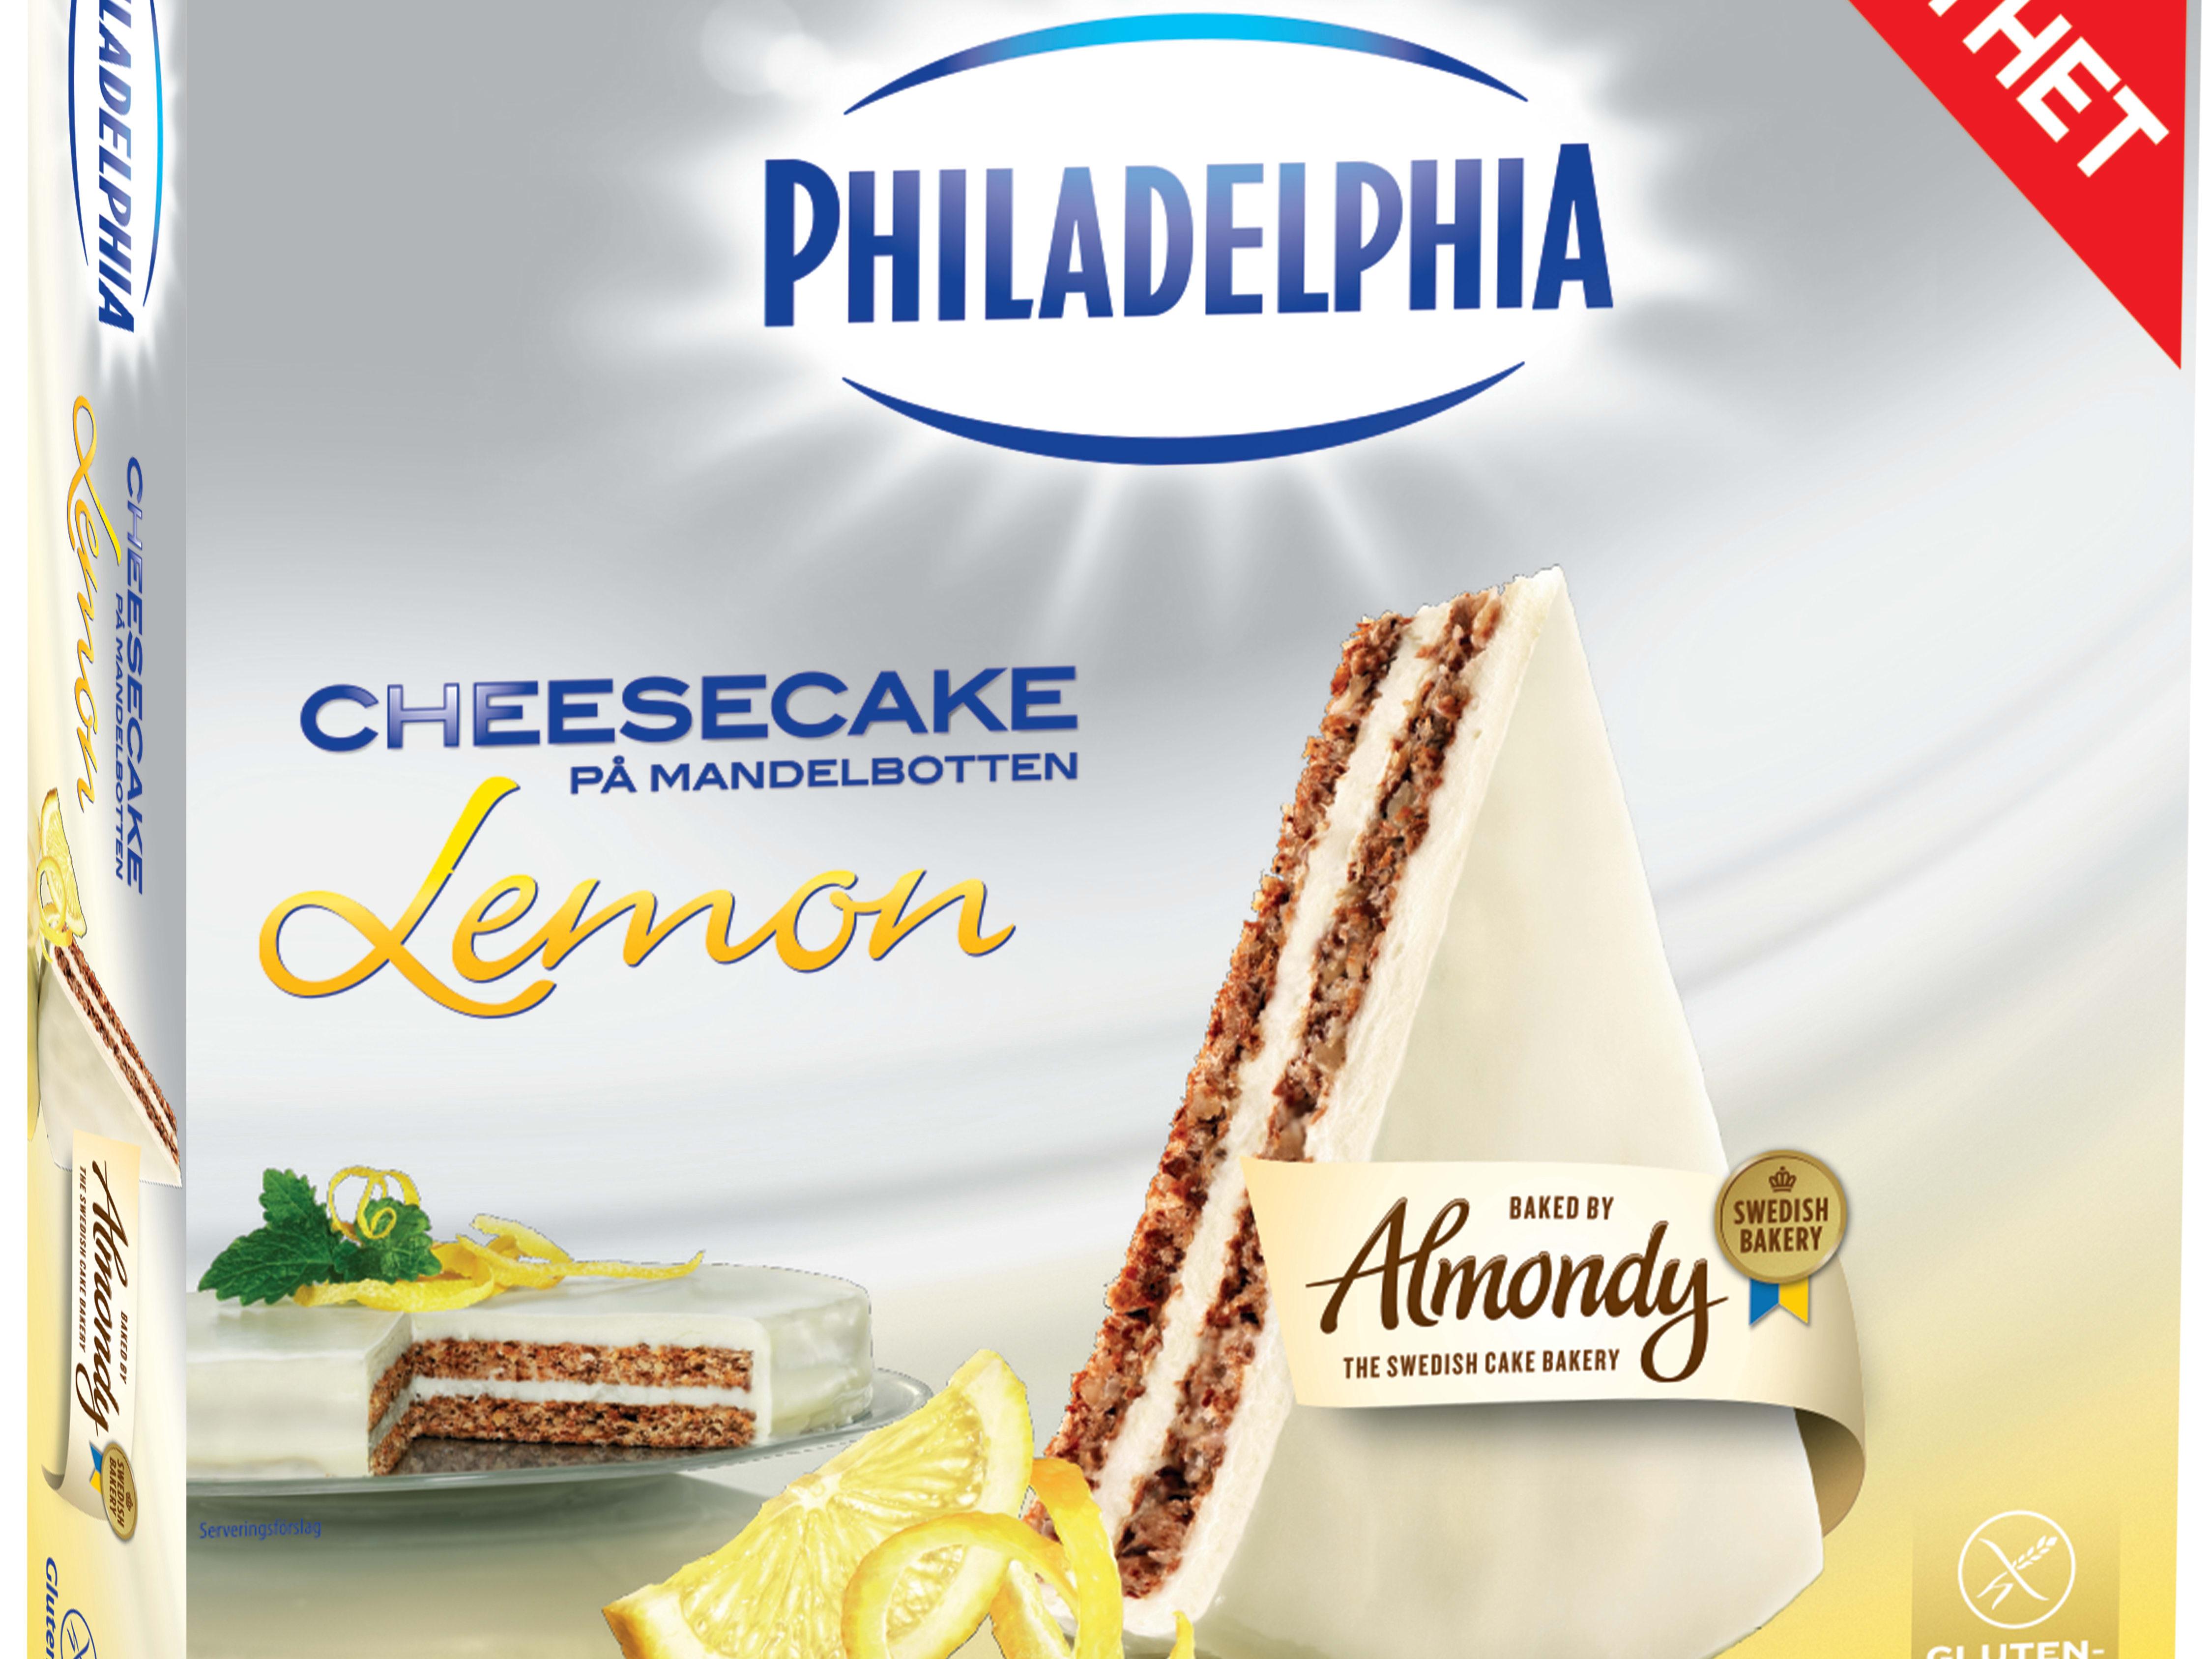 Almondy AB - Det var en gång… - Mynewsdesk Almondy Ab